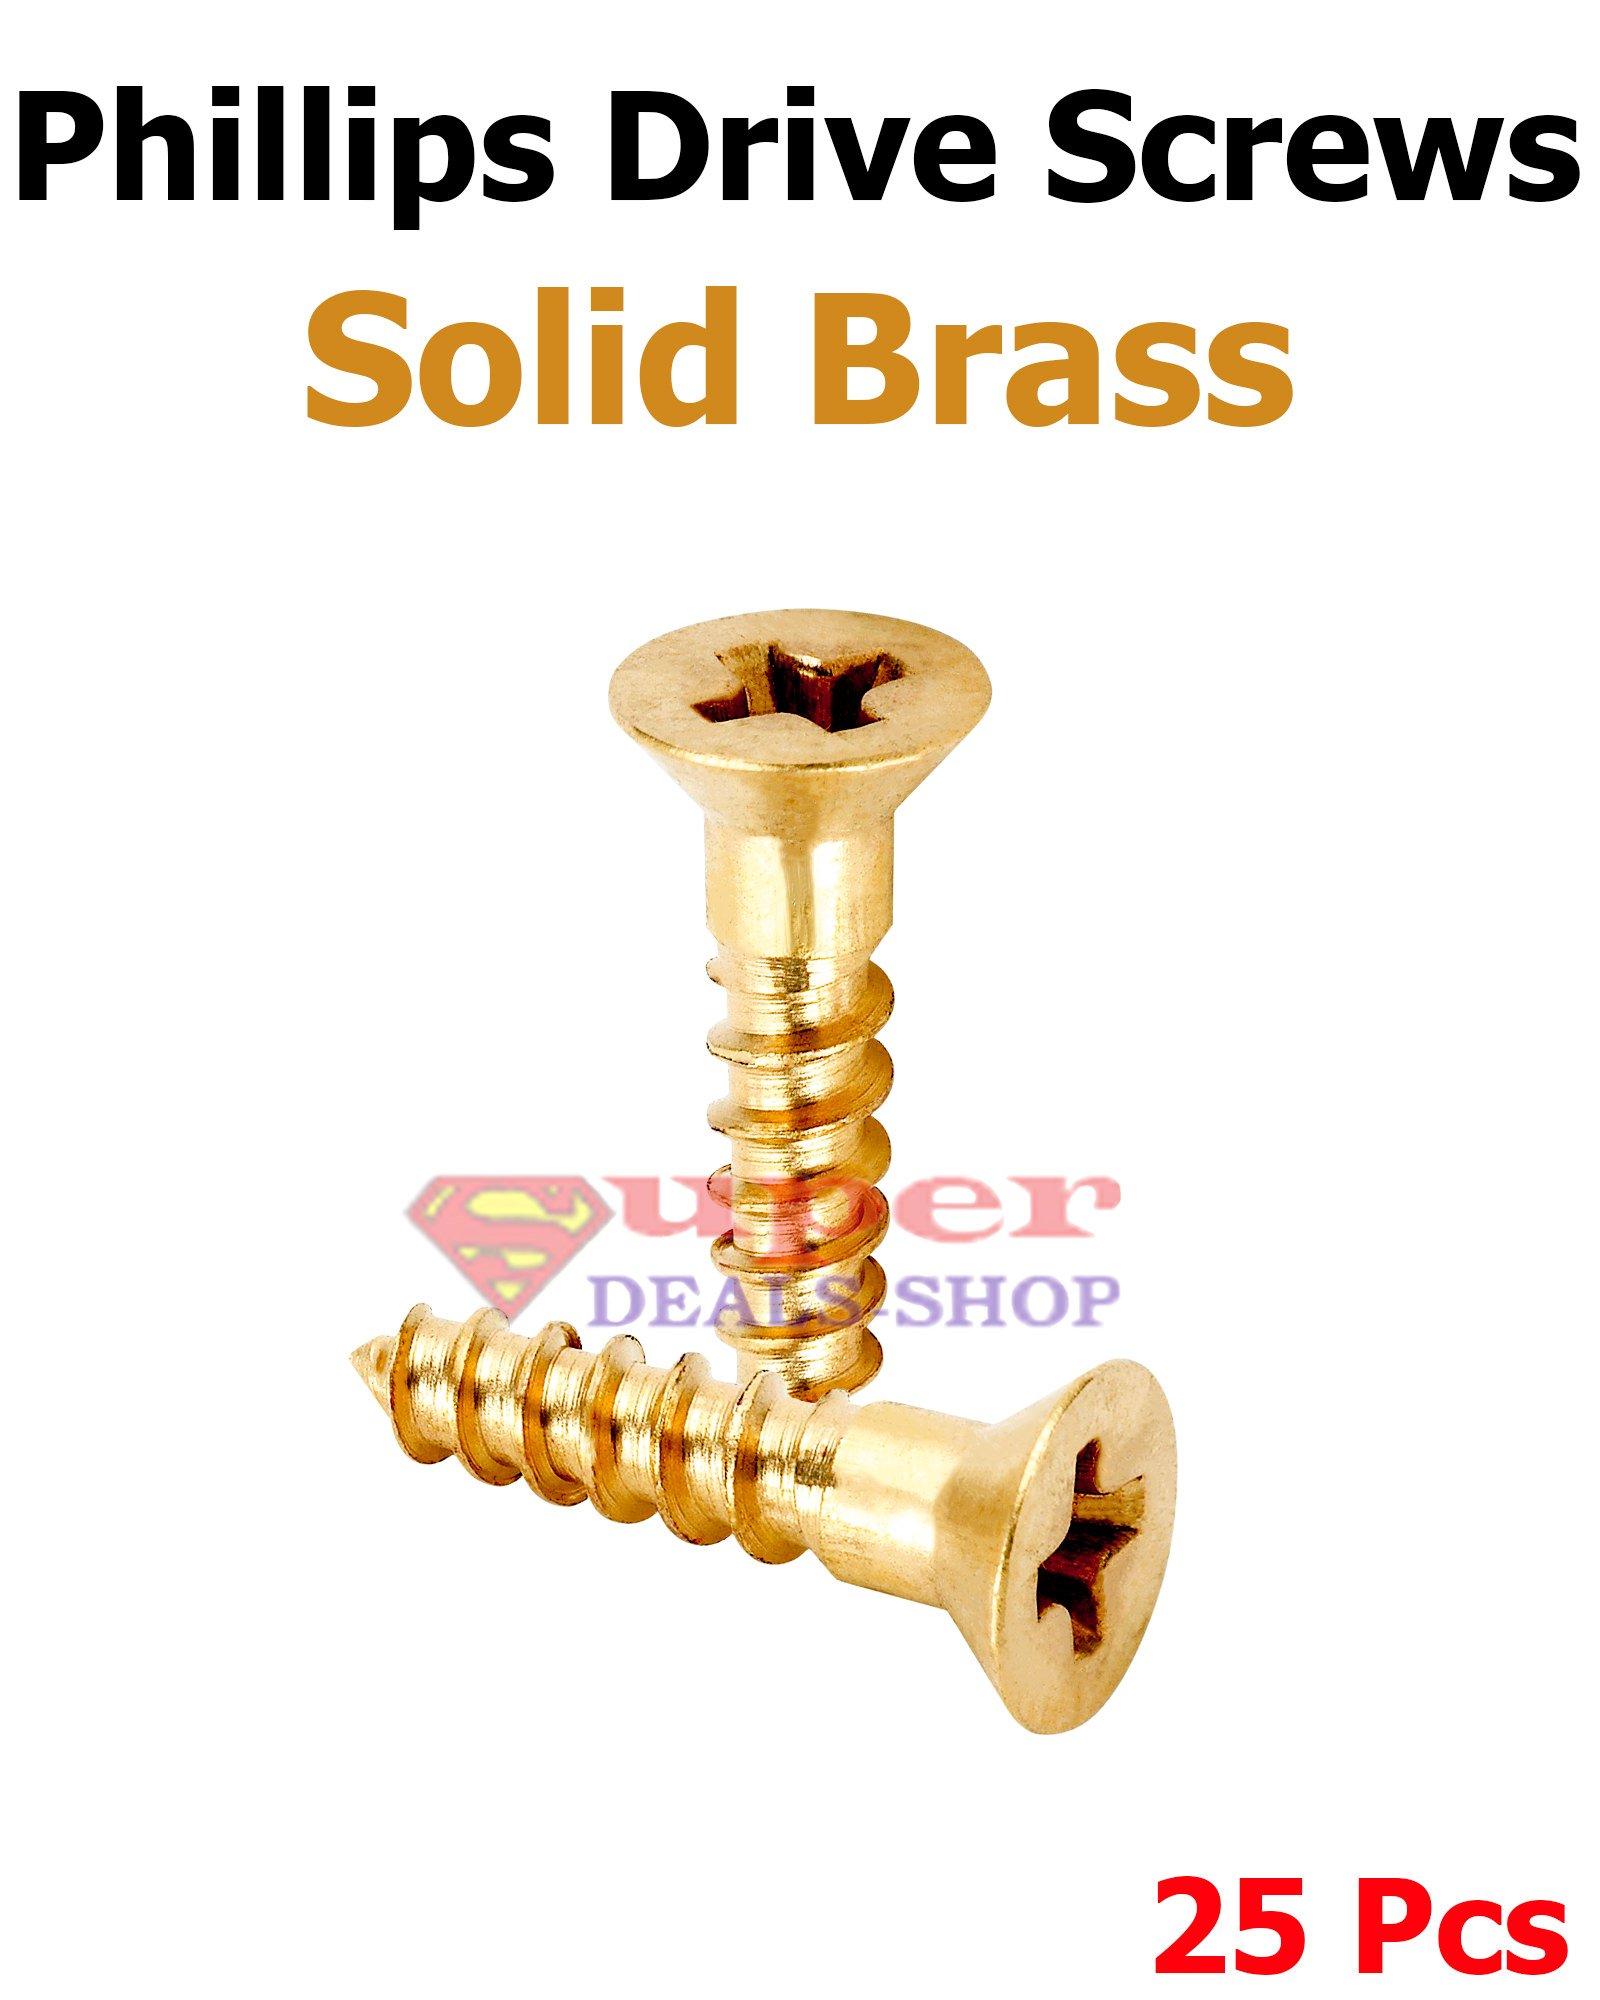 25 Pcs #6 x 1-3/4'' Wood Screws Phillips Drive Solid Brass Deep Thread Design Flat Head Screws Self Tapping Stainless Steel Super-Deals-Shop